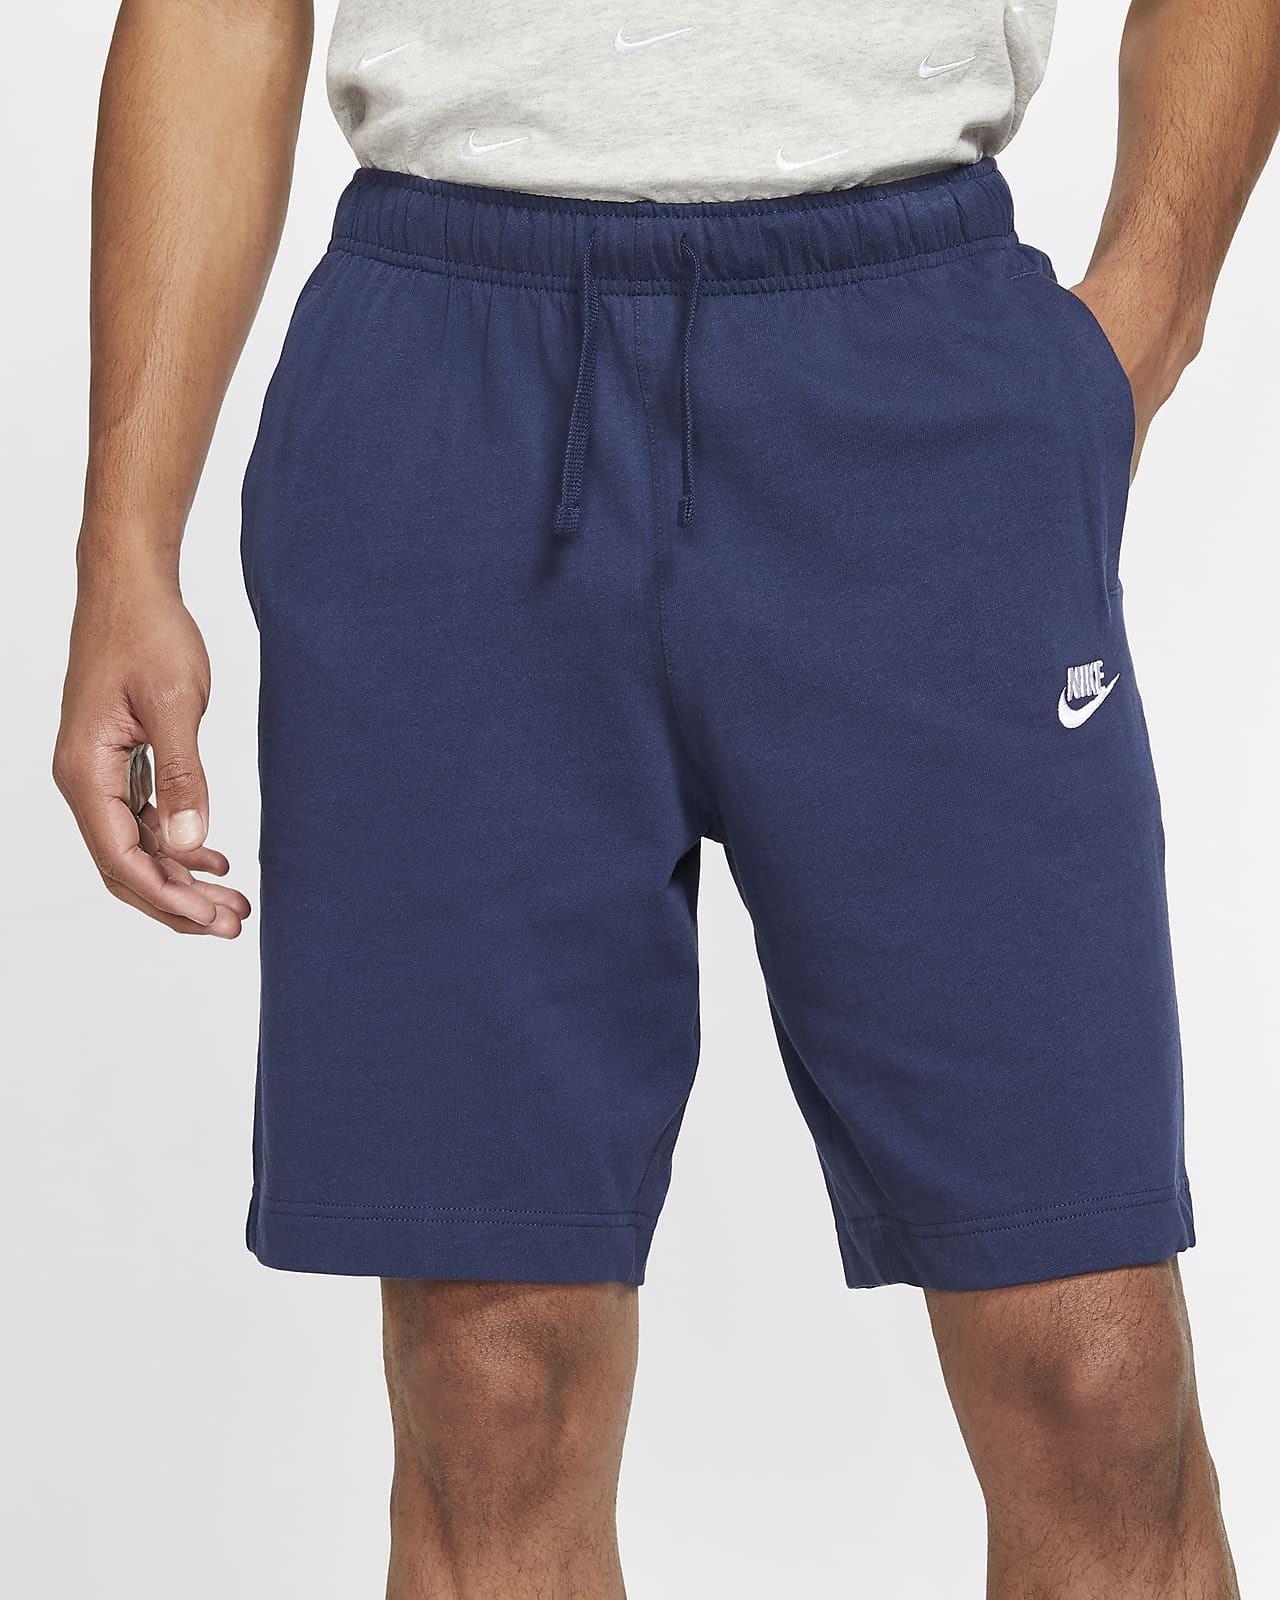 Pantaloncini Shorts UOMO Nike Blu Sportswear CLUB Tasche senza zip 2021 0